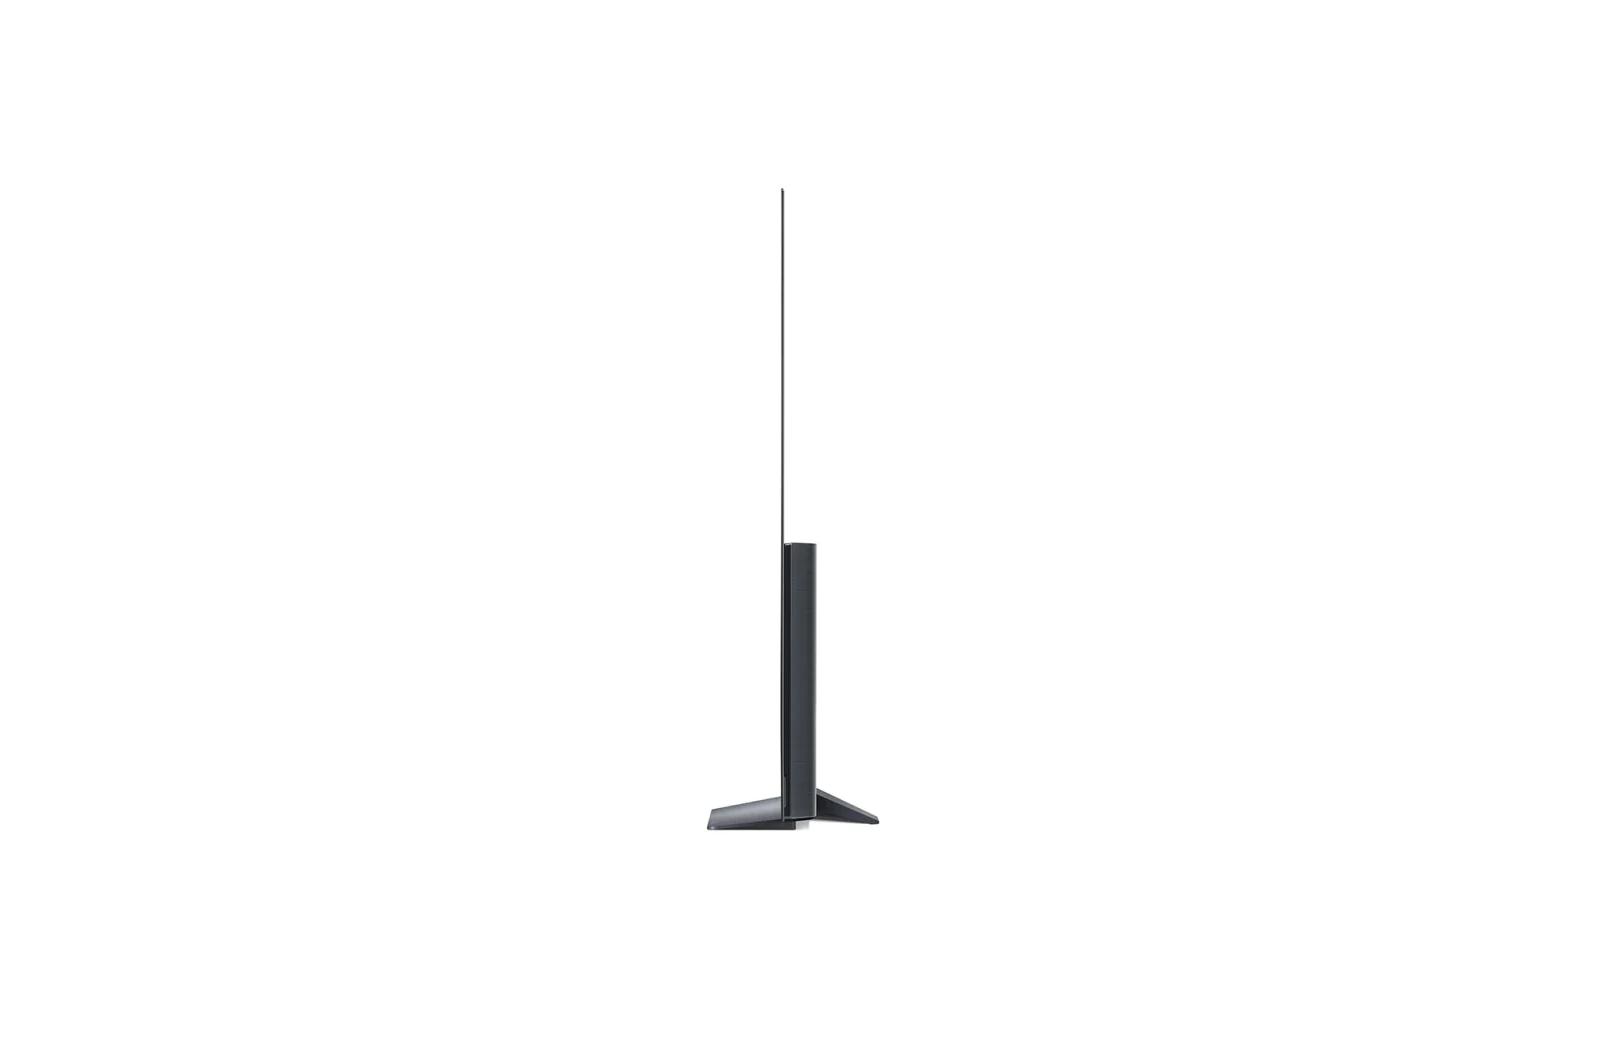 Televizor LG OLED65B1RLA  - 3